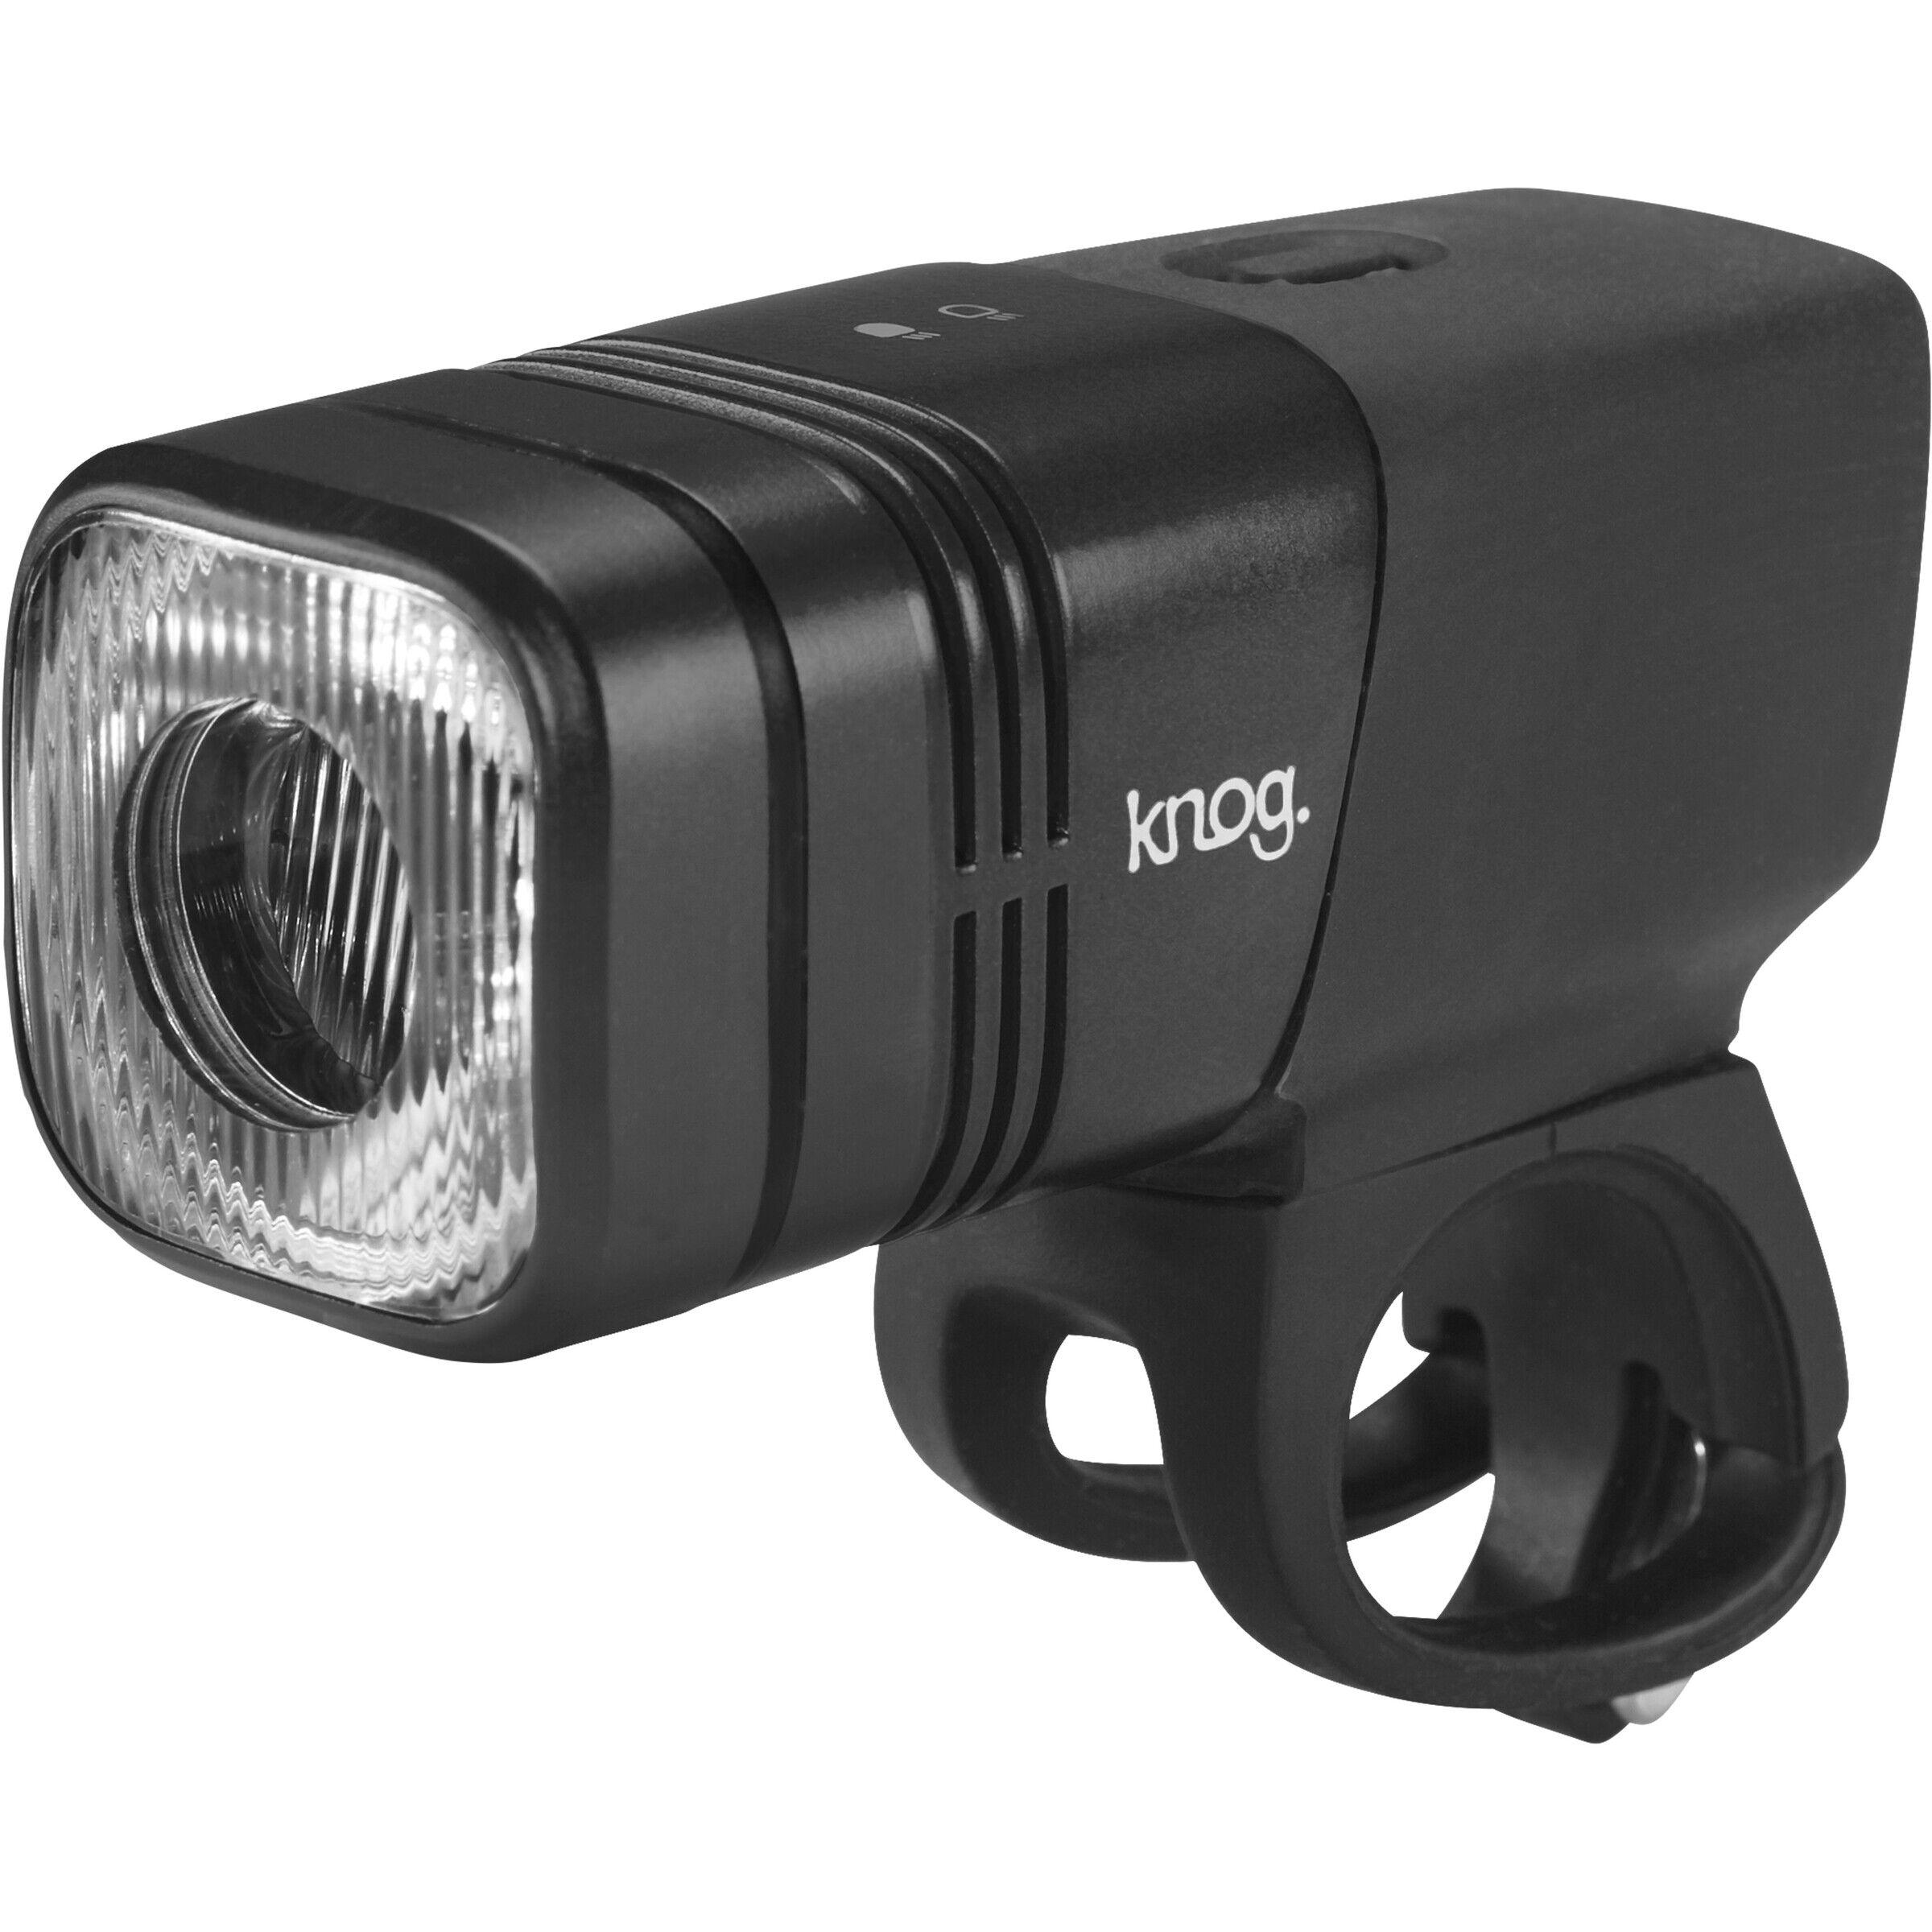 Knog Blinder MOB Frontlicht StVZO weiße LED black 2019 Fahrradbeleuchtung